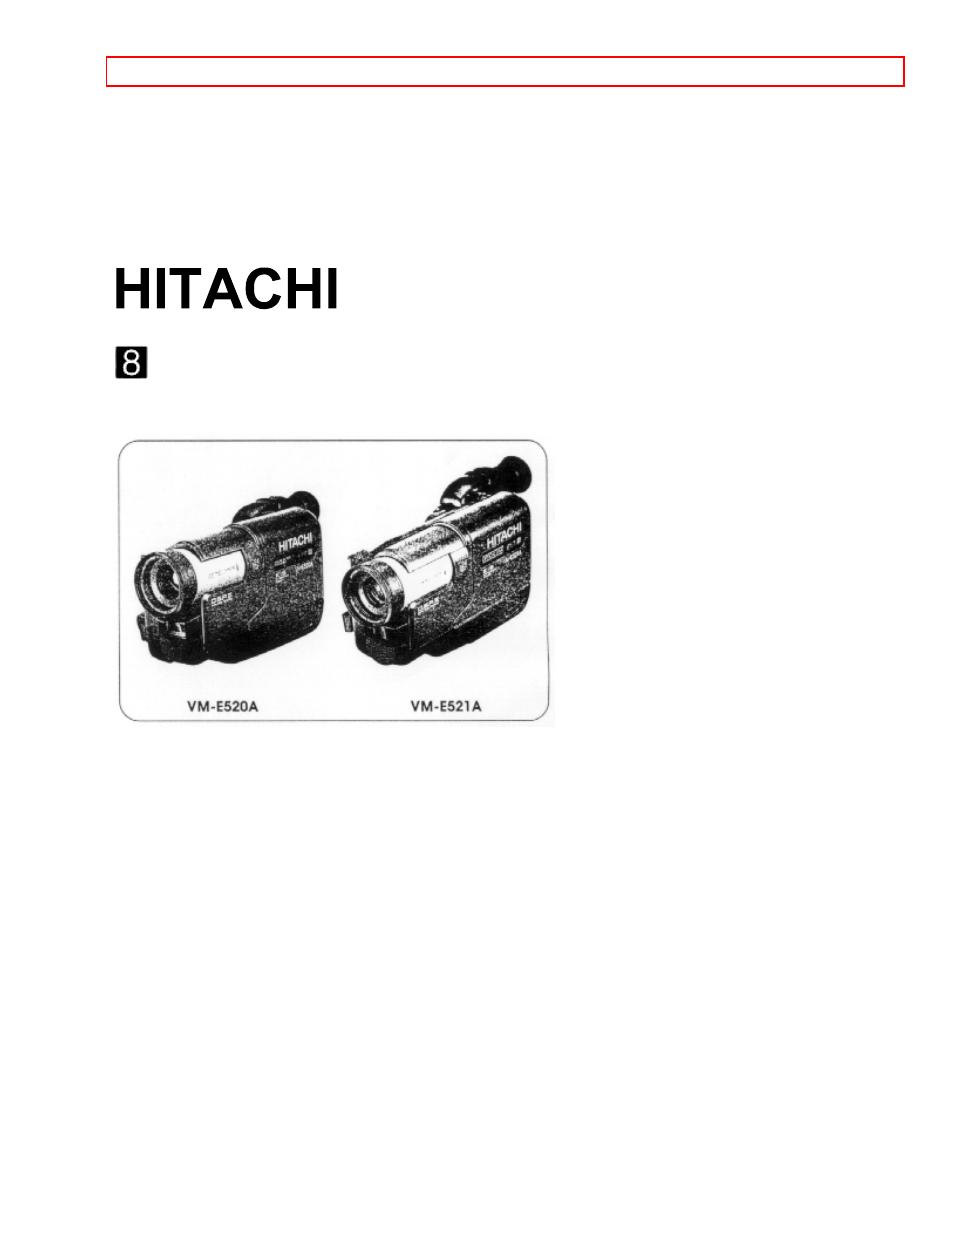 hitachi vm e520a user manual 50 pages rh manualsdir com hitachi vm-d865la manual hitachi vm-d865la manual